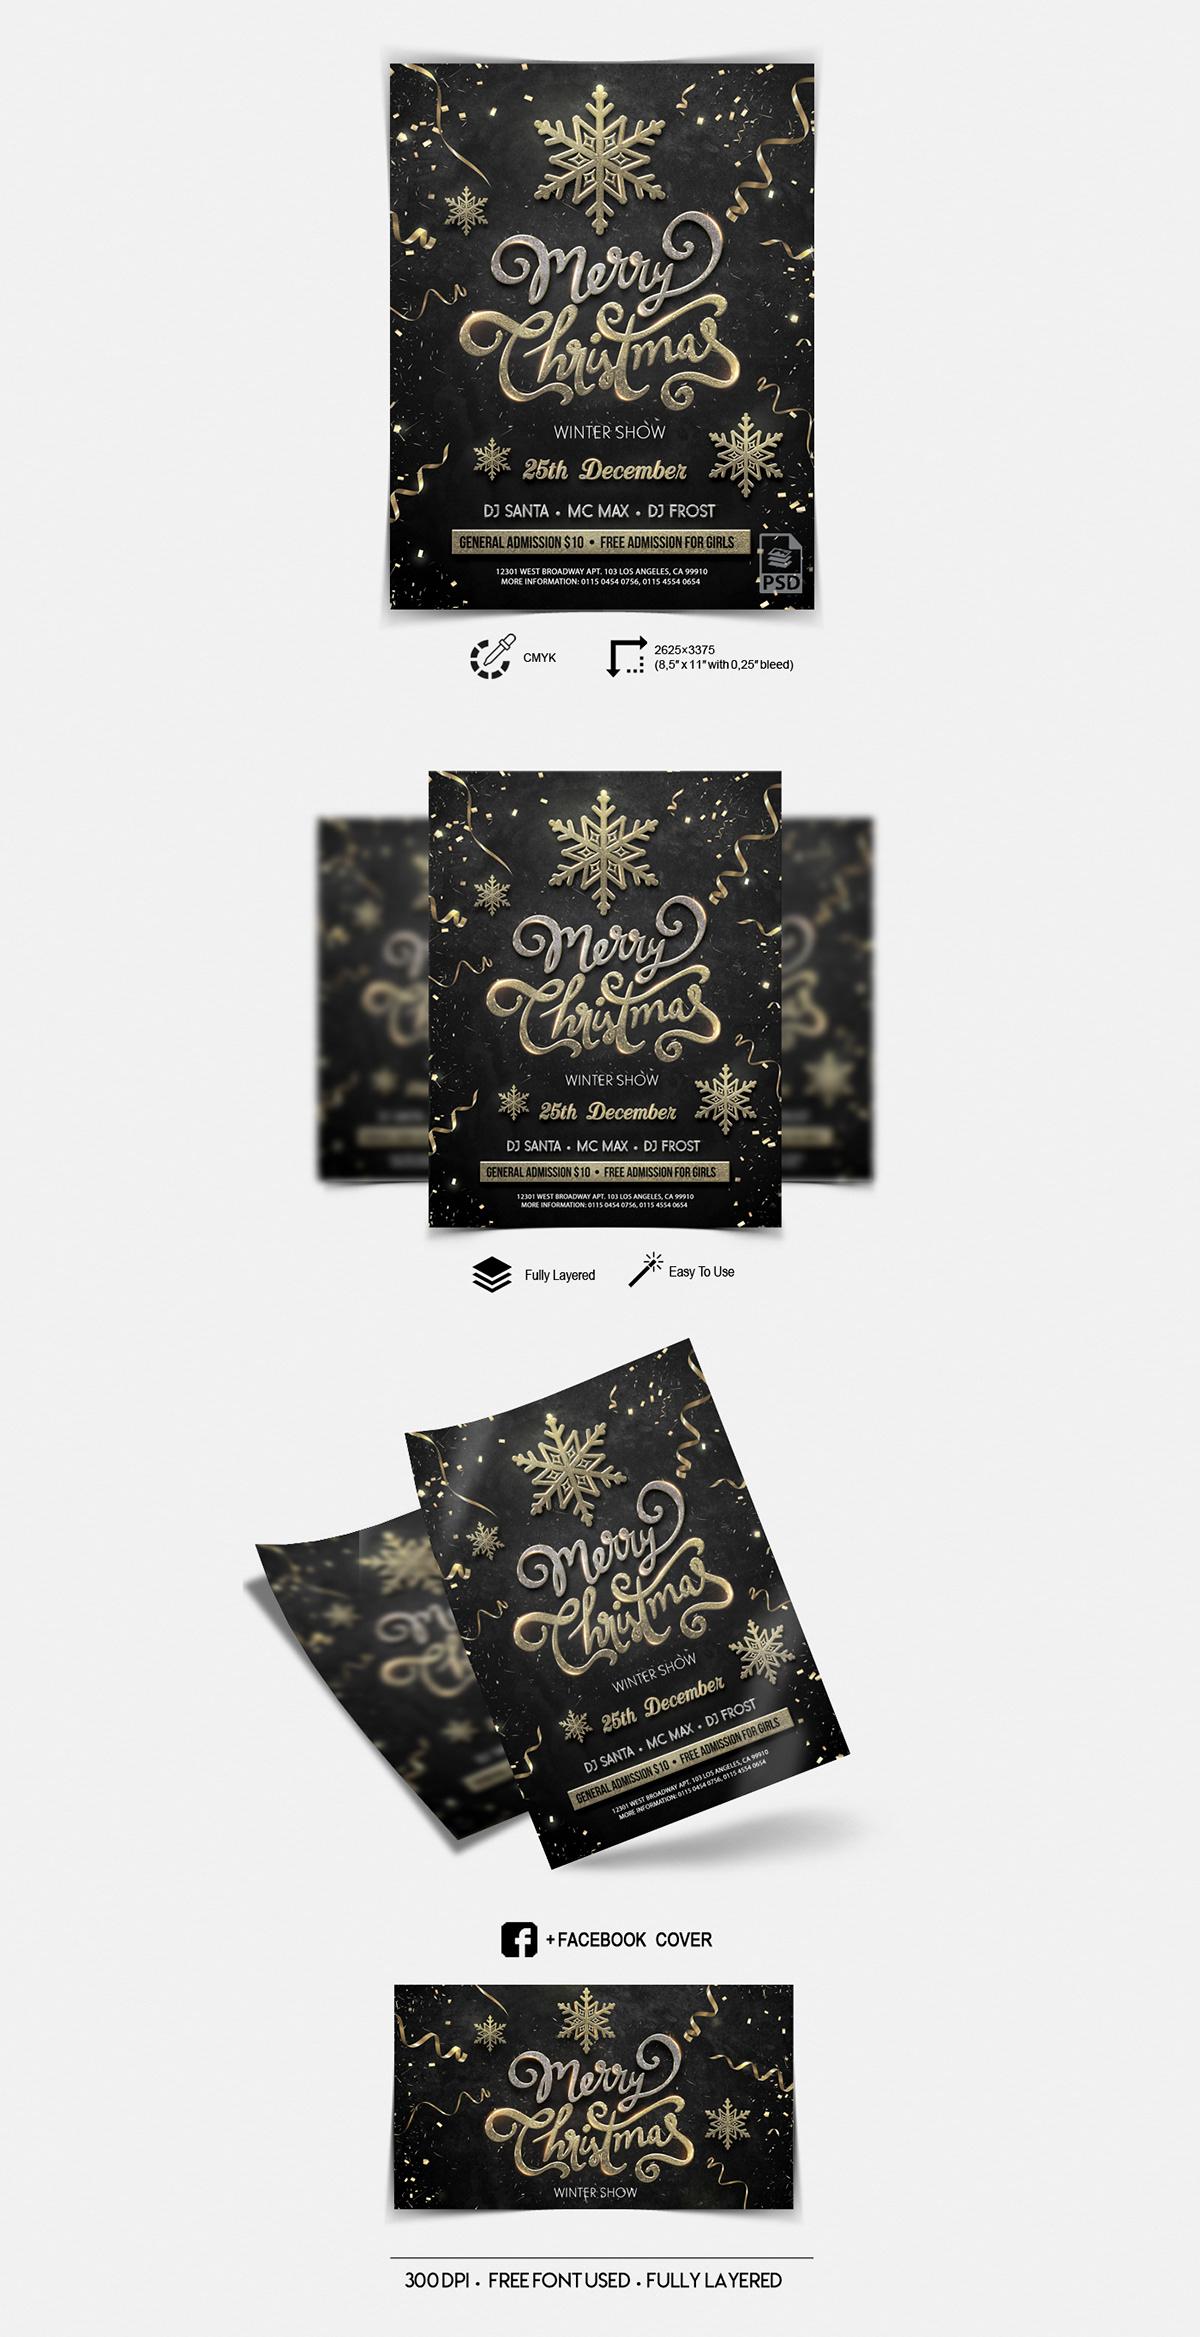 Merry Christmas - PSD Flyer Template